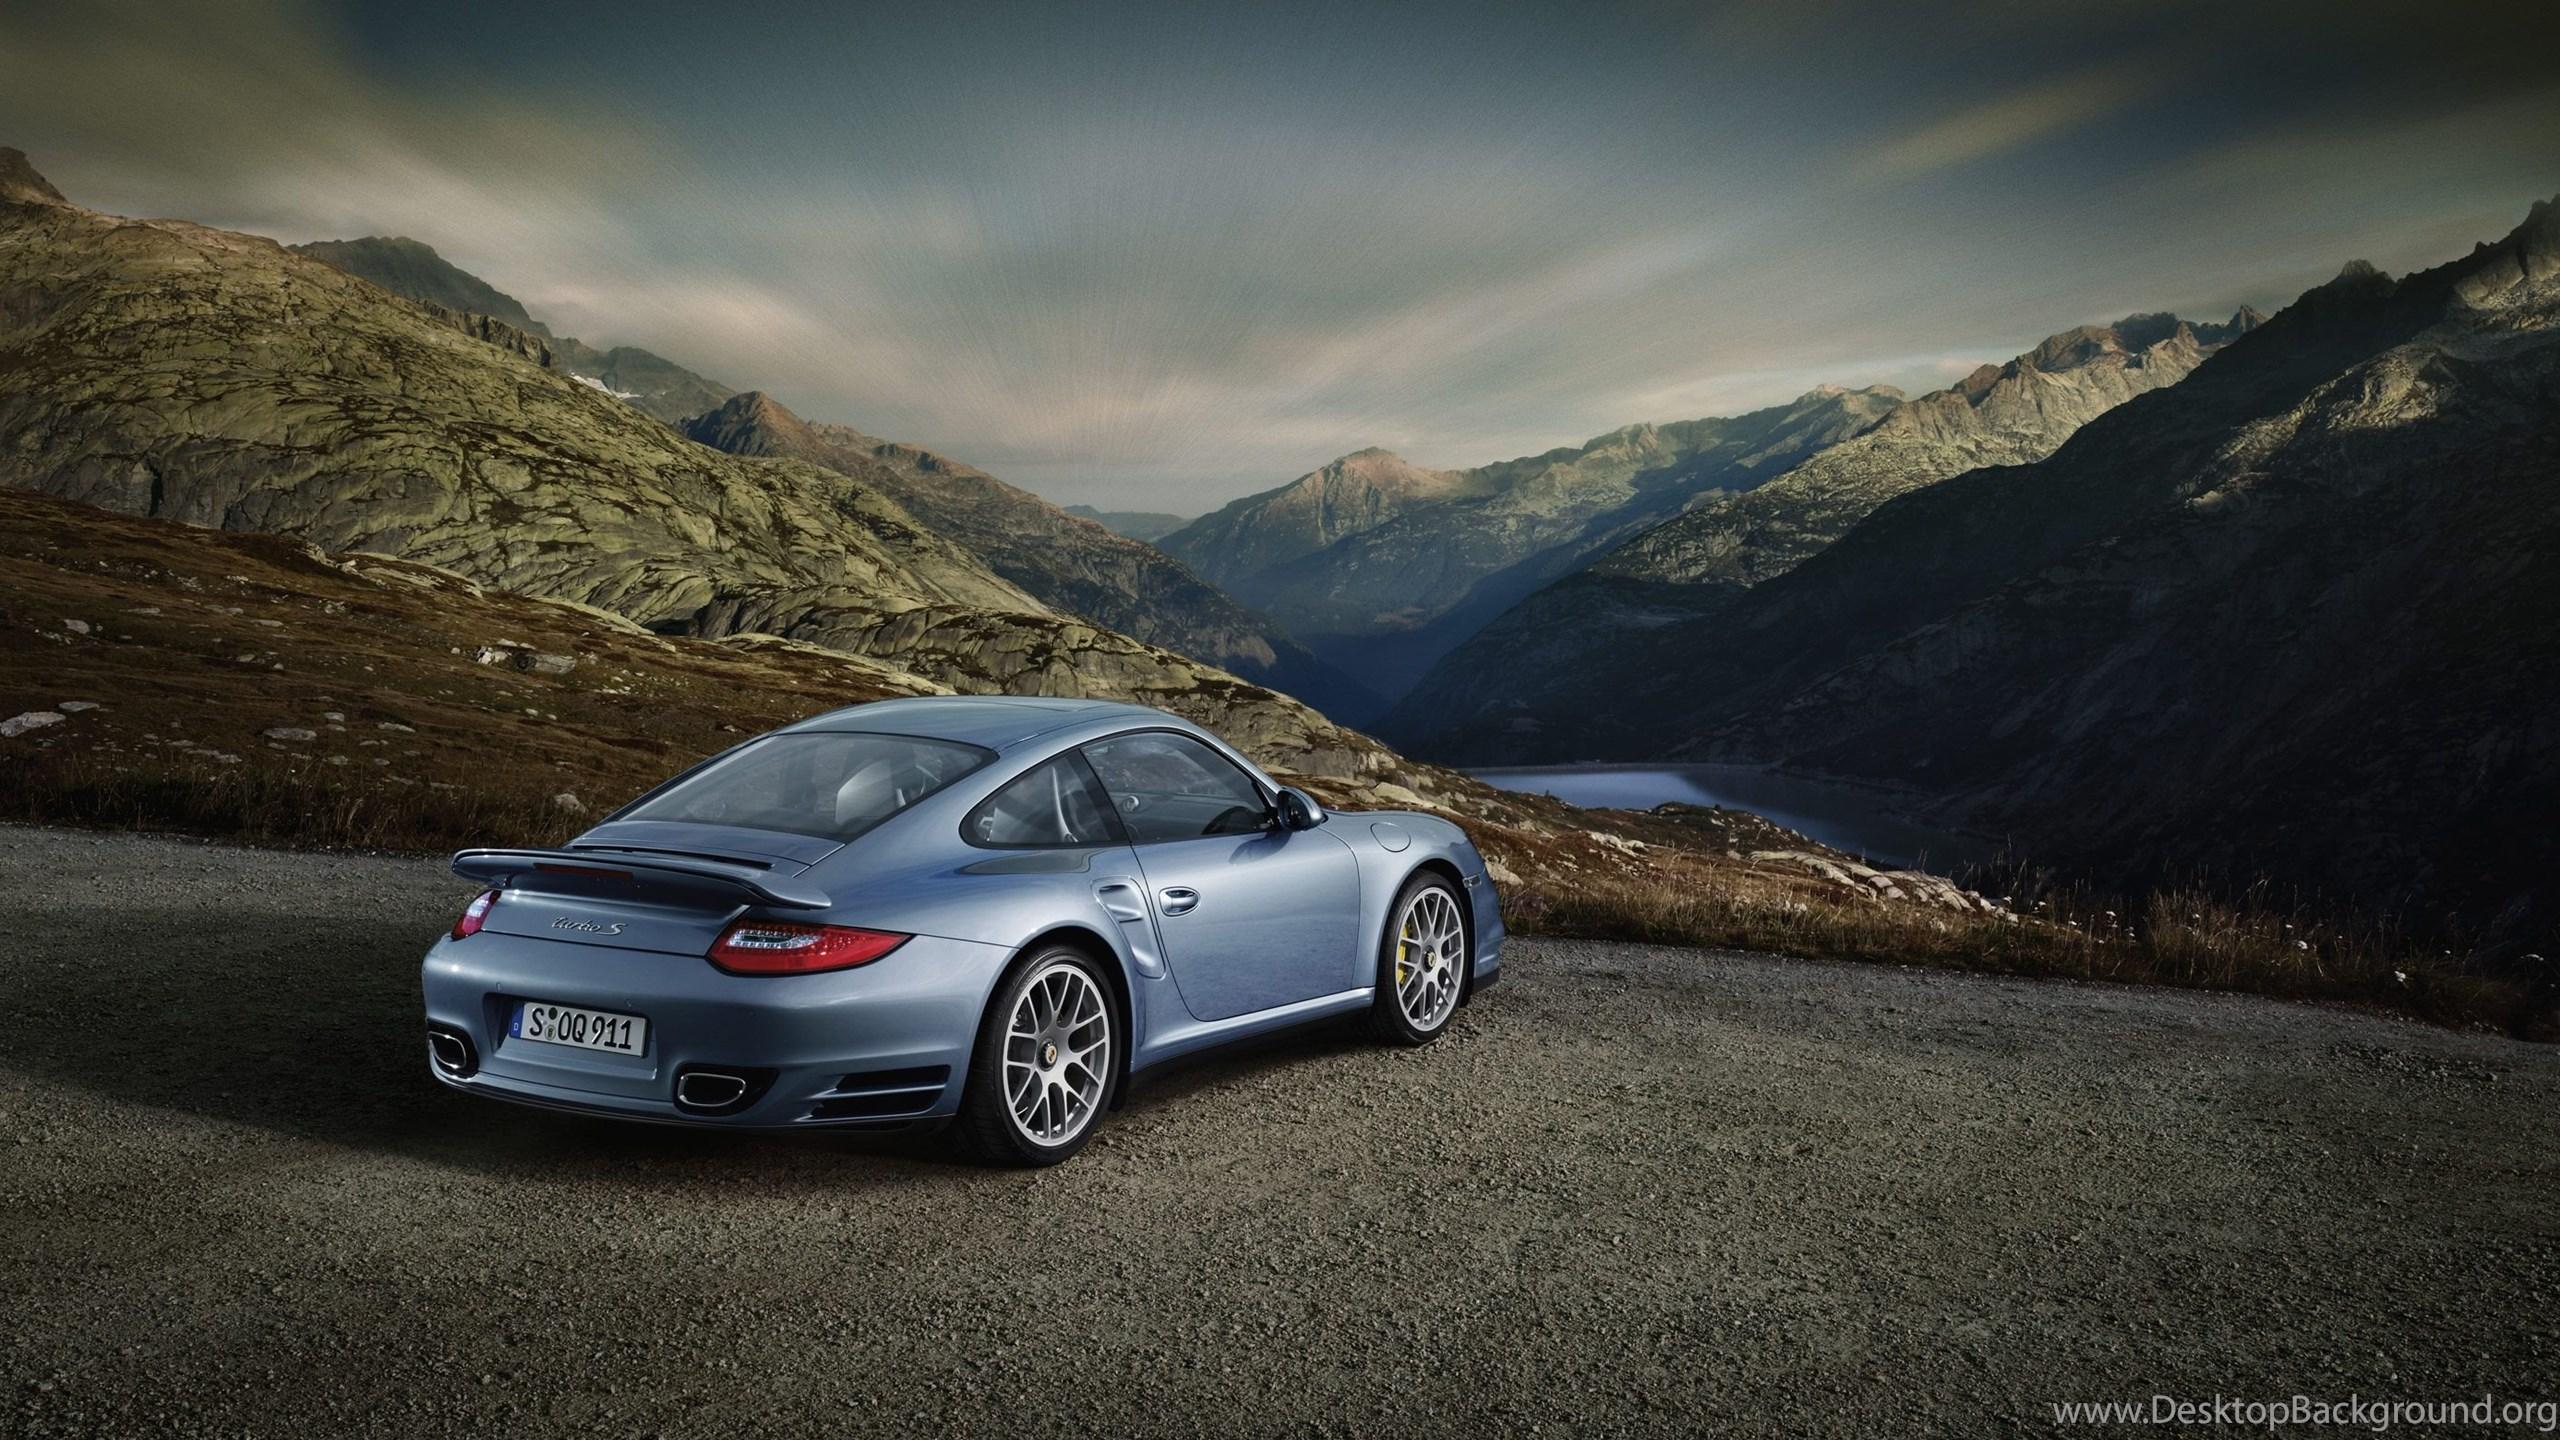 Porsche Carrera S >> Porsche 911 Turbo S Sports Car Wallpapers HD 59102 Full HD ...